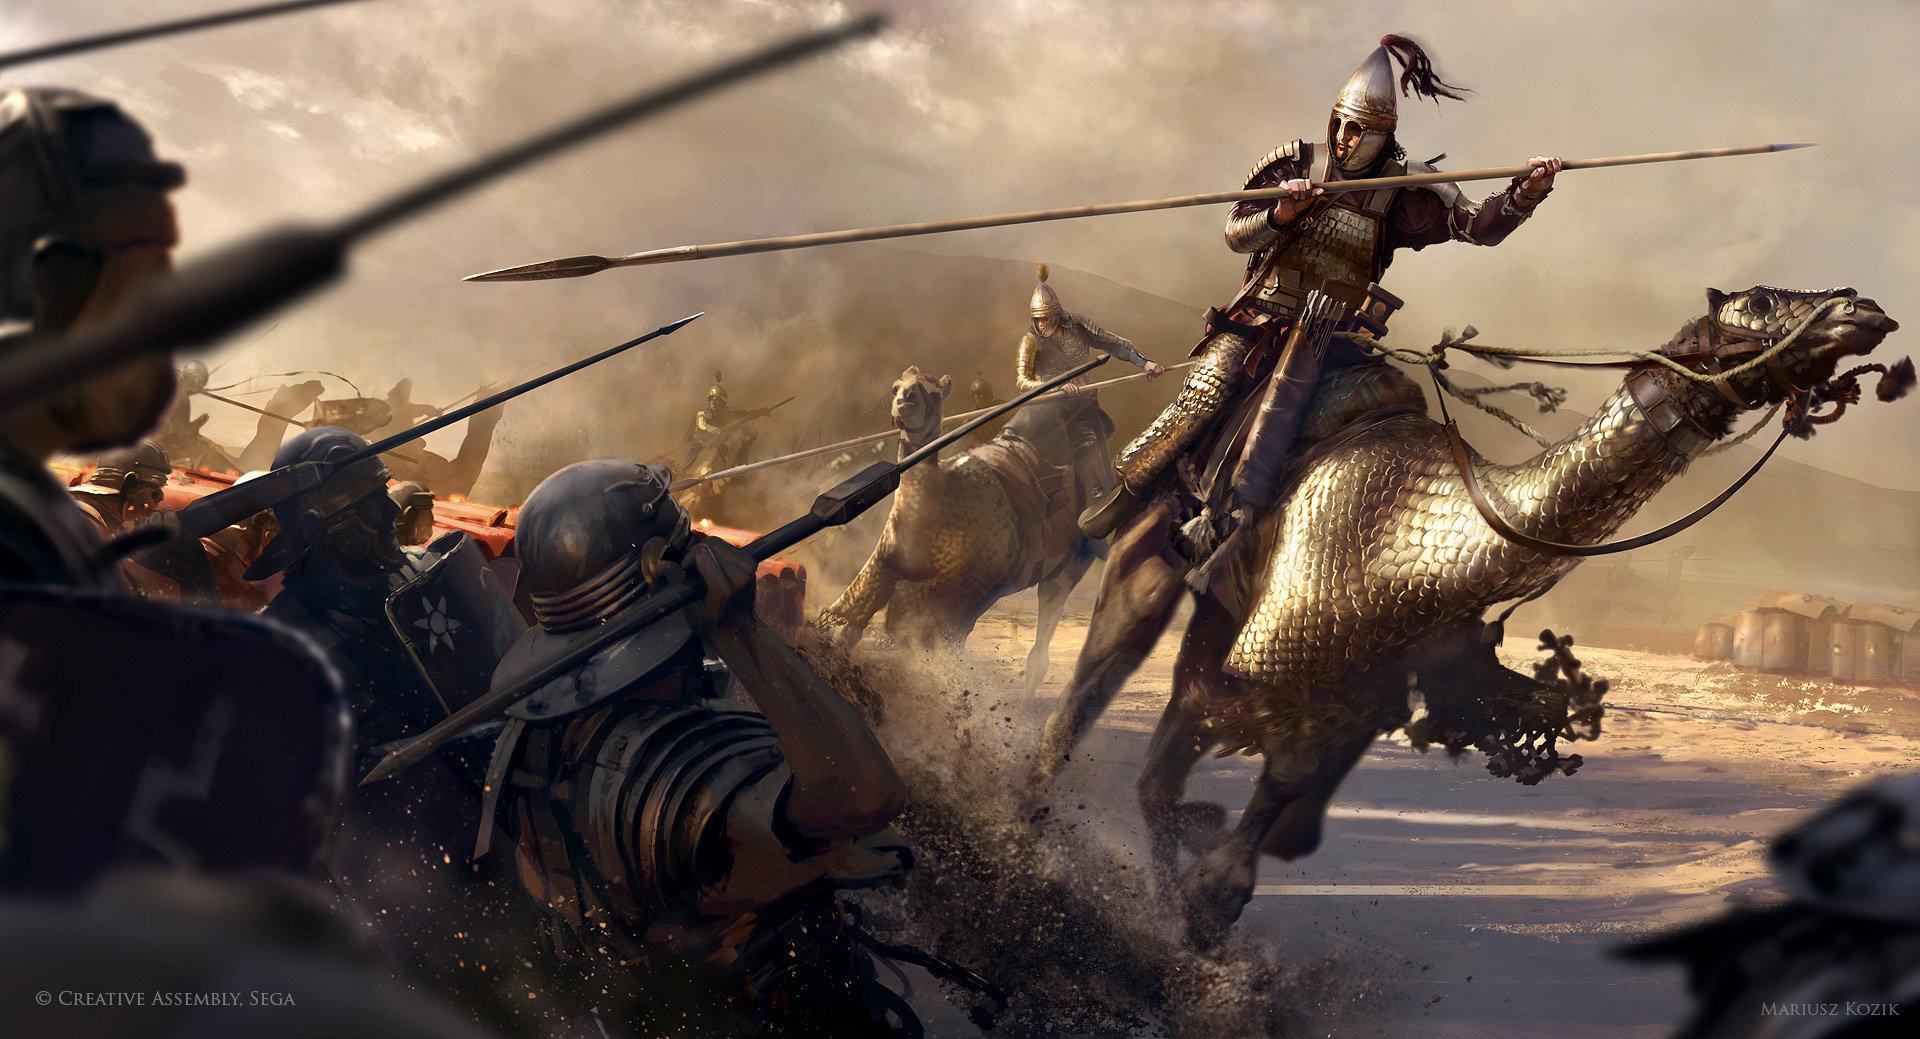 100 - 200 AD (Guardians)